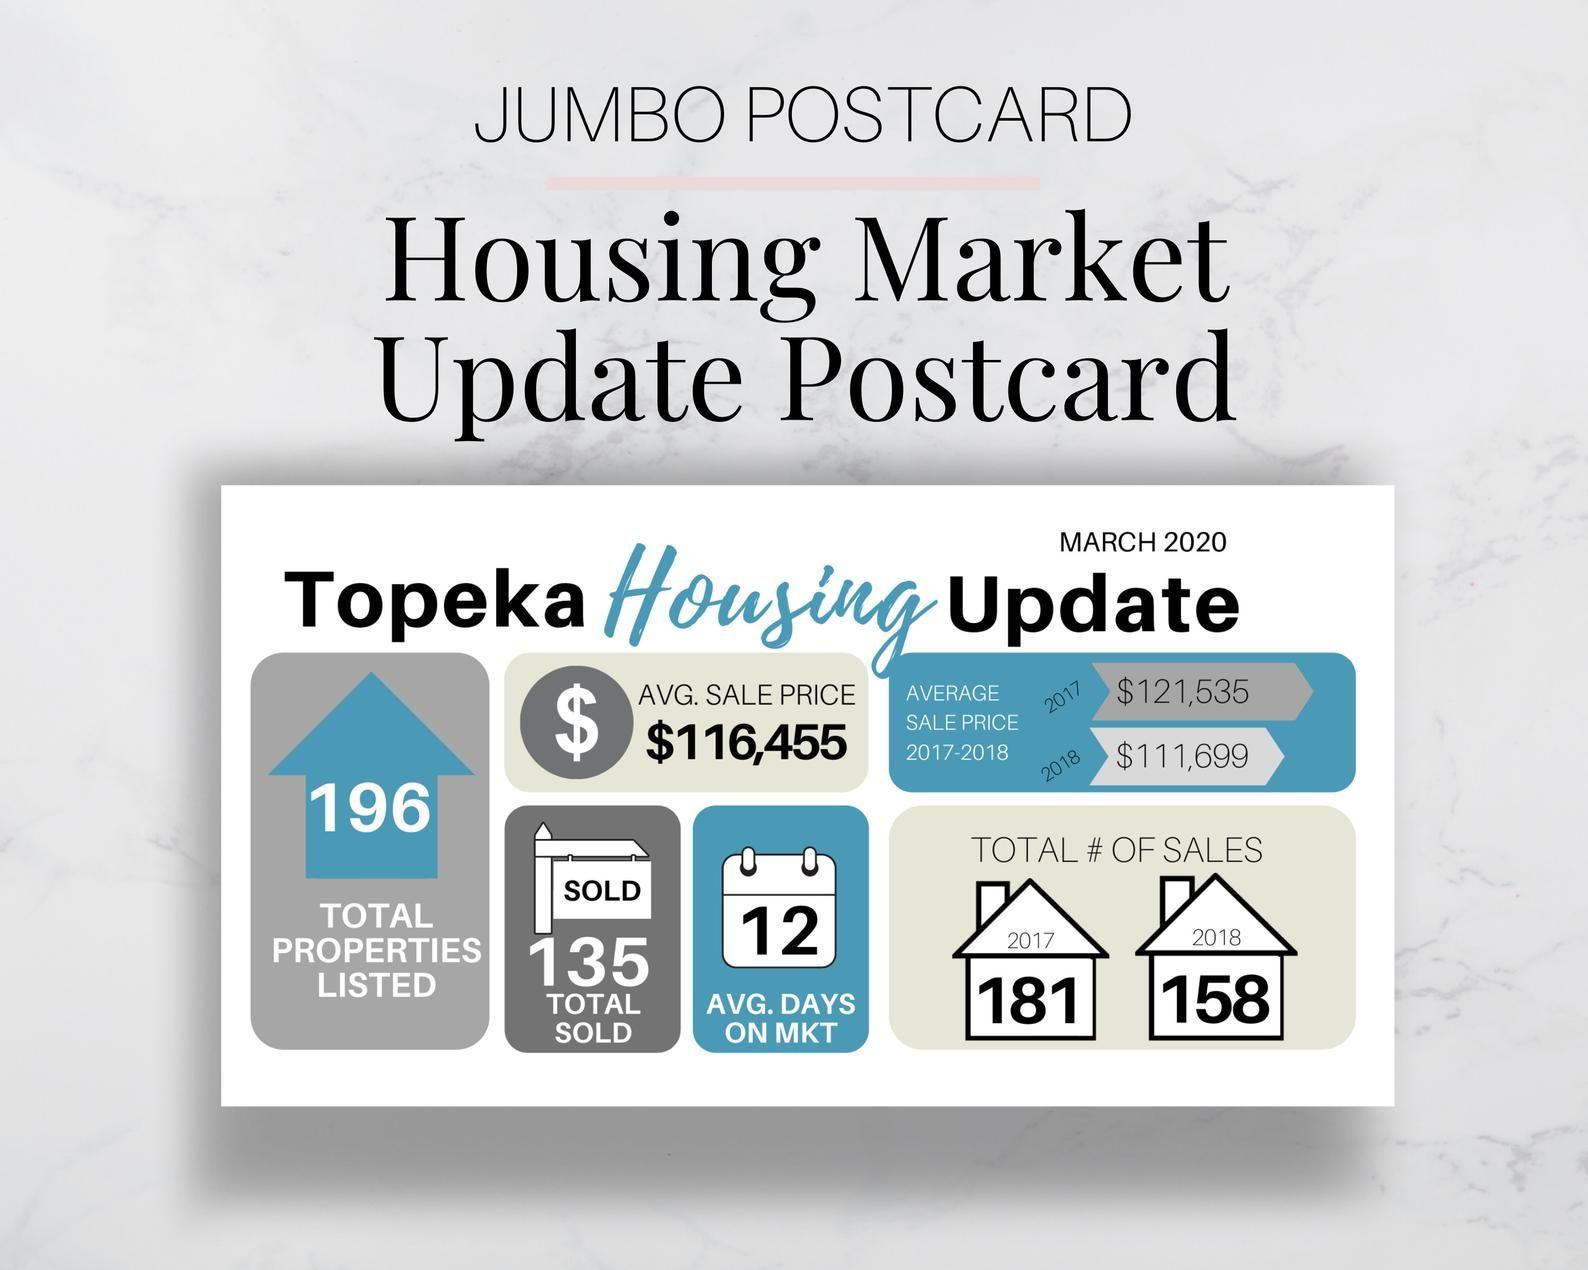 Housing Market Update 1 Postcard Real Estate Market Update Real Estate Postcard Real Estate Marketing Realtor Marketing Real Estate In 2021 Realtor Marketing Real Estate Postcard Housing Market Real estate market update template